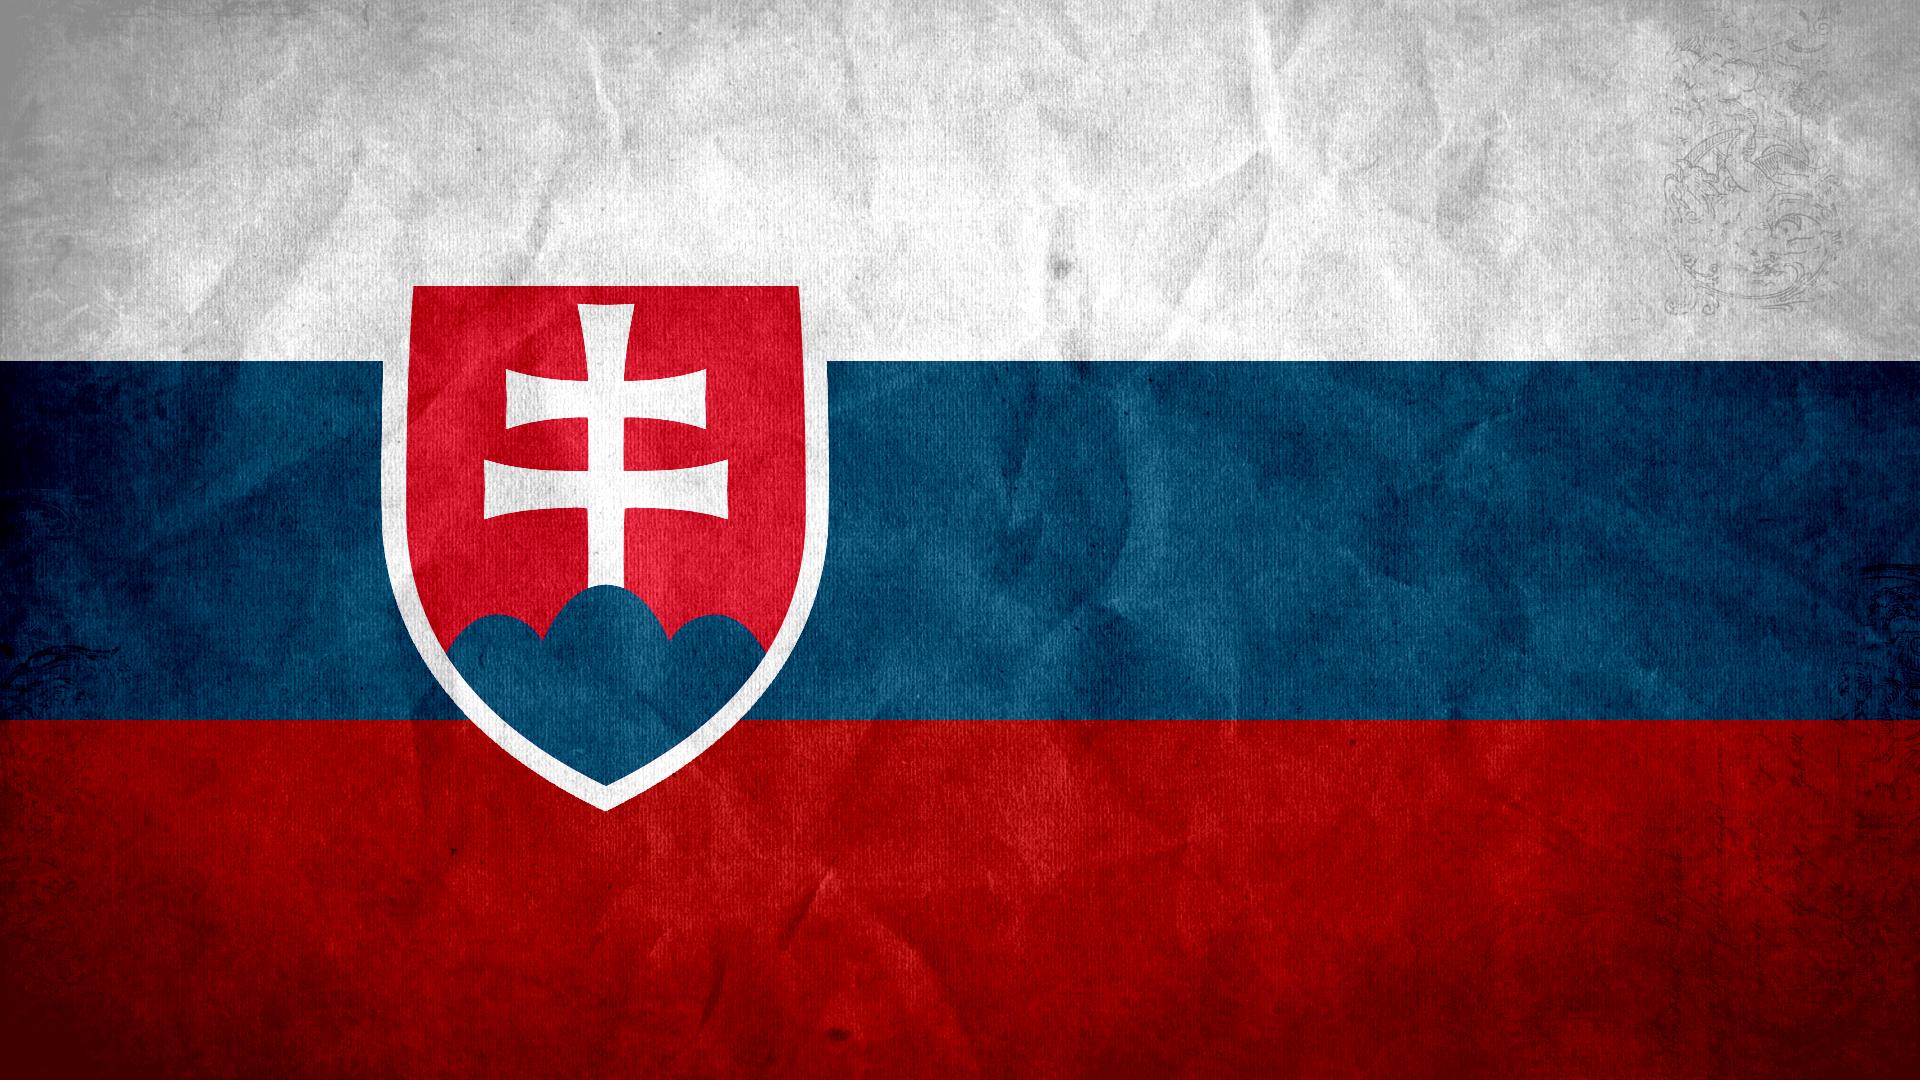 Flag of Slovakia HD Wallpaper Background Image 1920x1080 ID 1920x1080